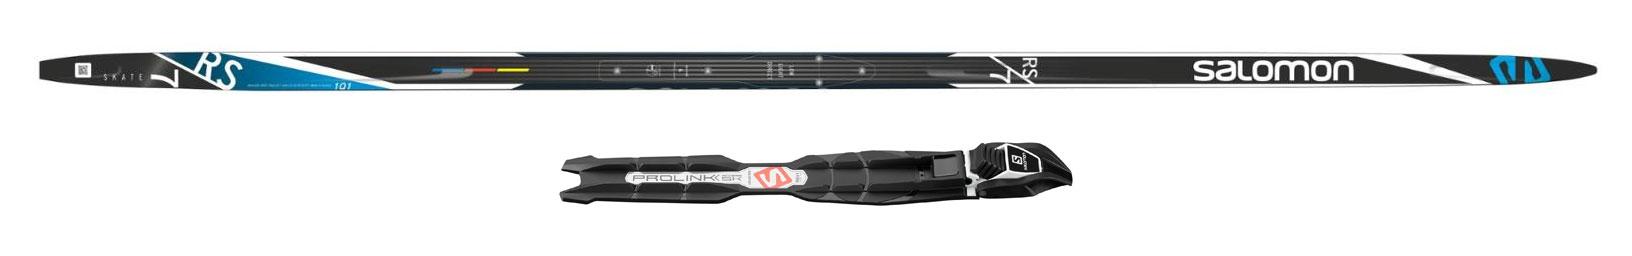 Salomon RS 7 Skate Skis with Prolink Bindings